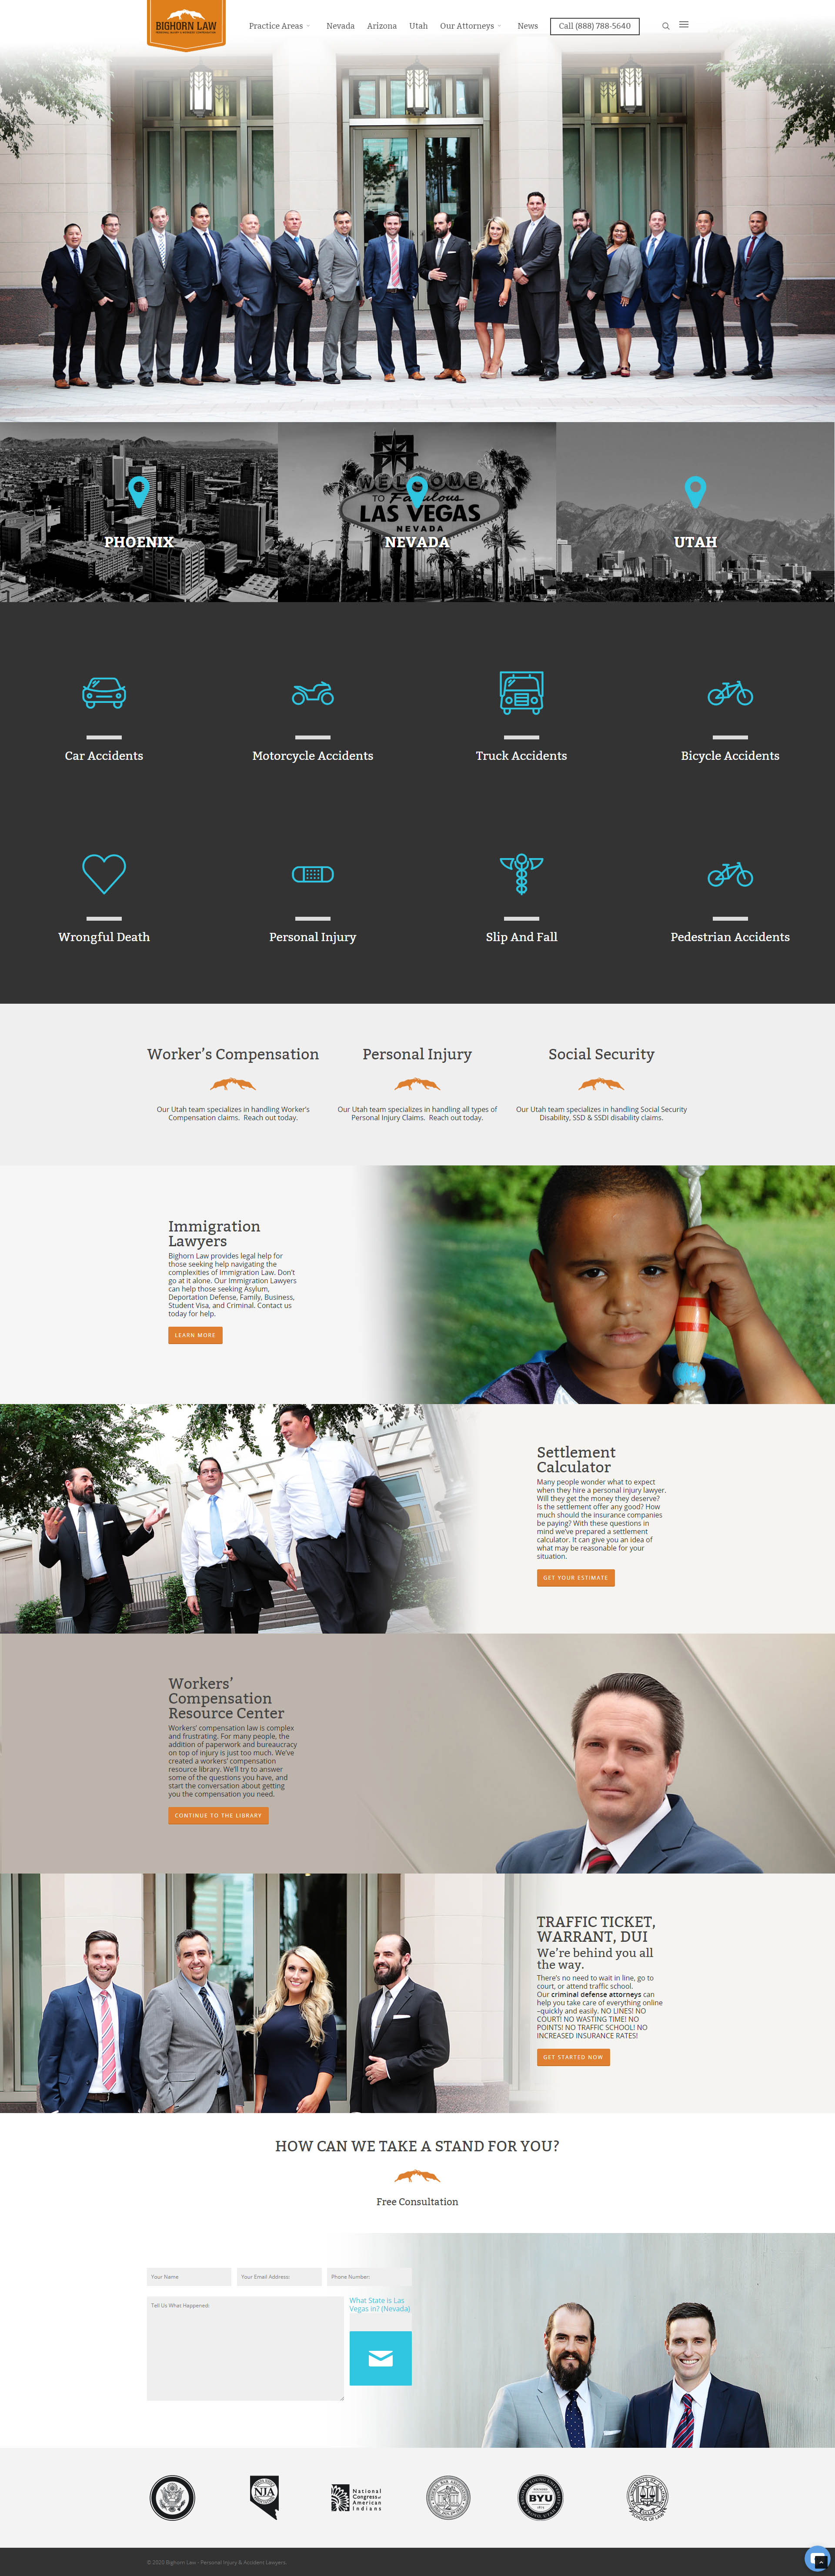 Previous Legal Website Design Sample